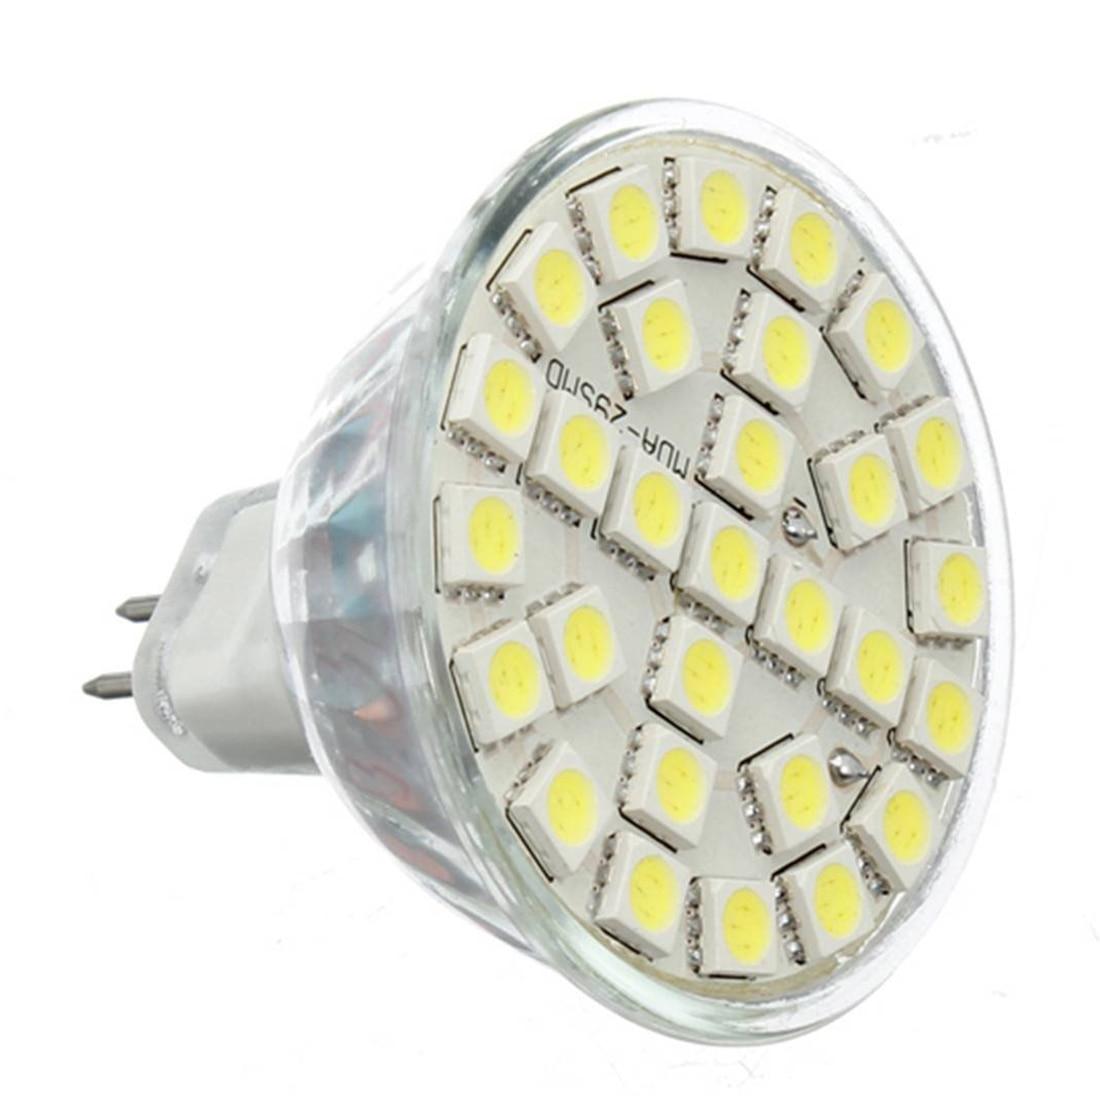 CSS 10X Gu5.3 MR16 5W Cold White 5050SMD 29LED 480LM High Power LED Spotlight Bulbs 220V carprie super drop ship new 2 x canbus error free white t10 5 smd 5050 w5w 194 16 interior led bulbs mar713